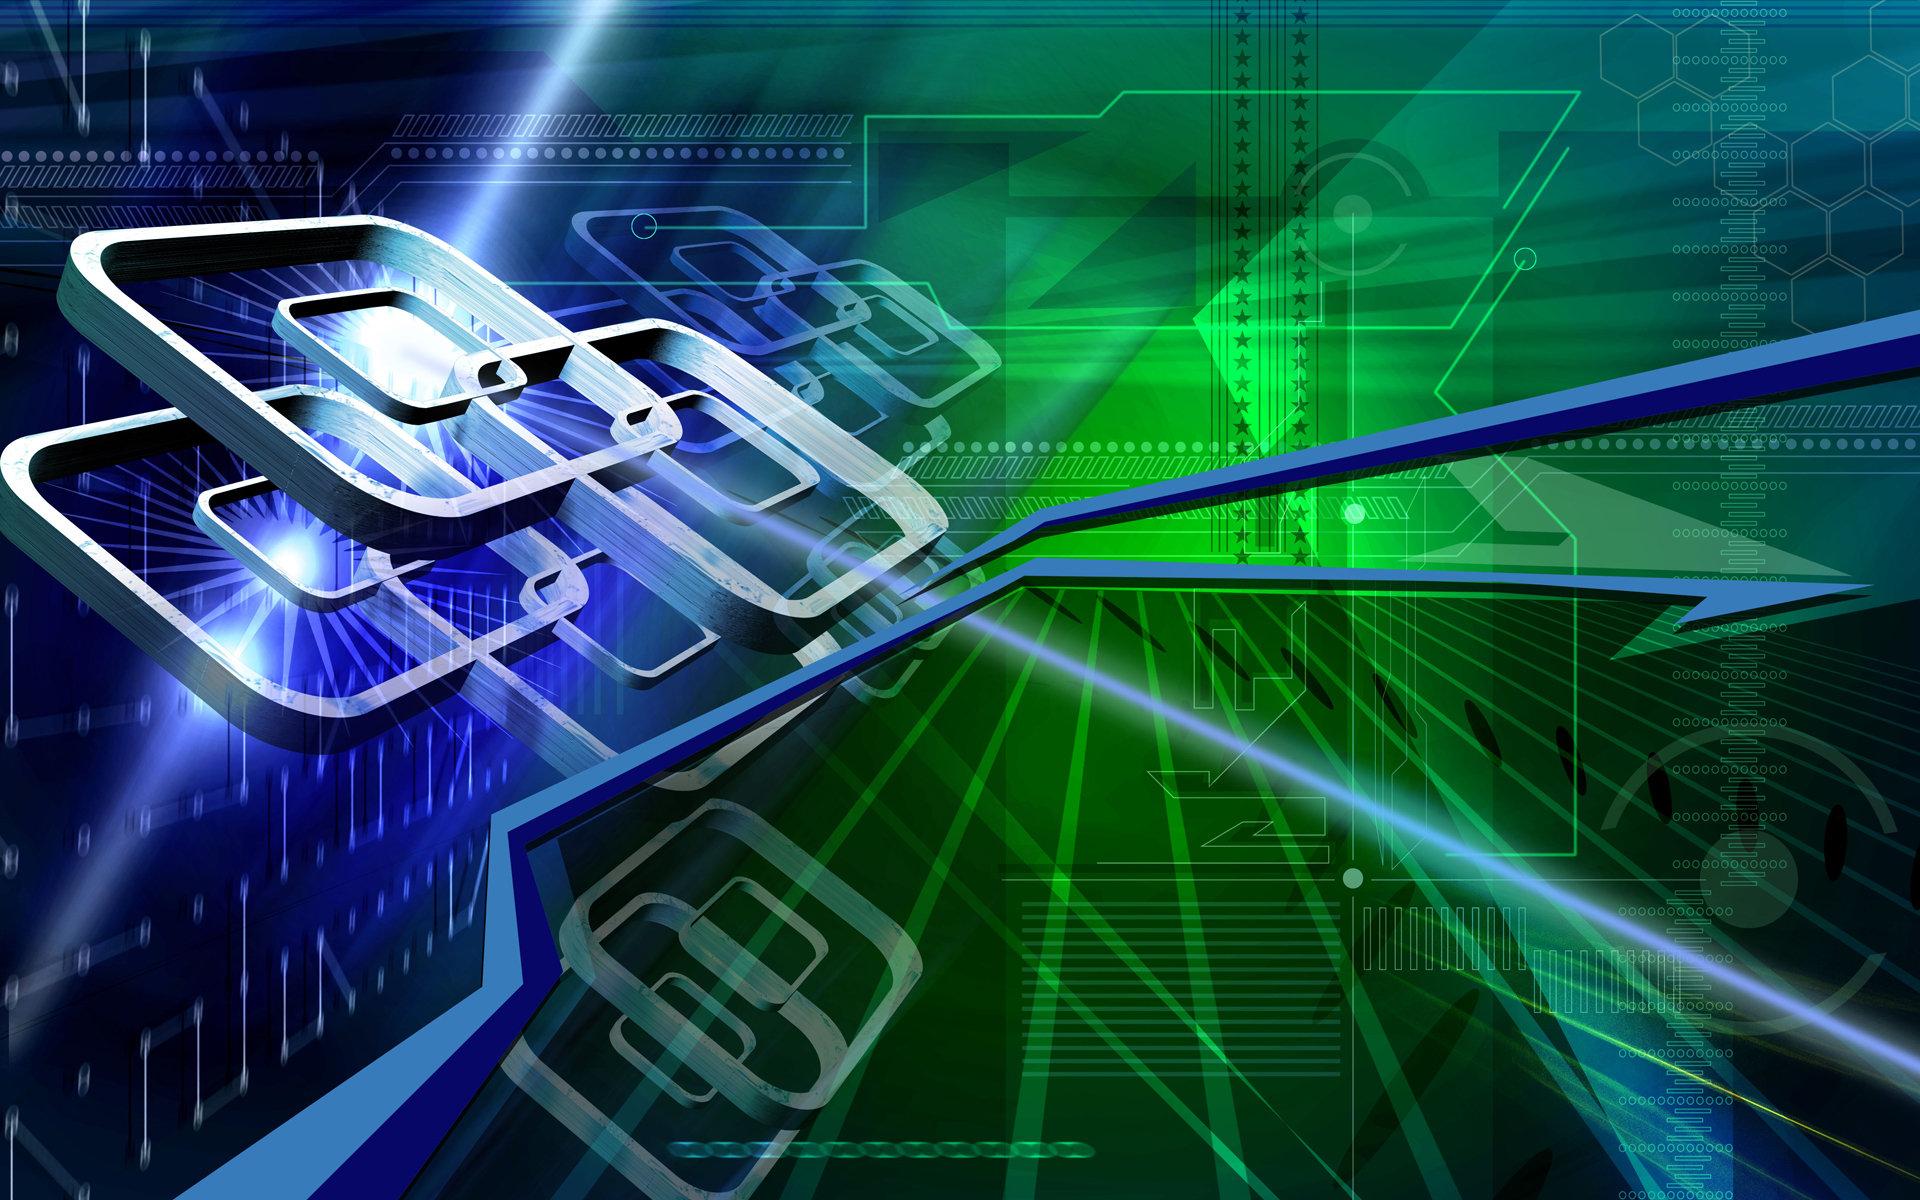 45 Hi Tech Wallpapers For Desktop and Laptops 1920x1200